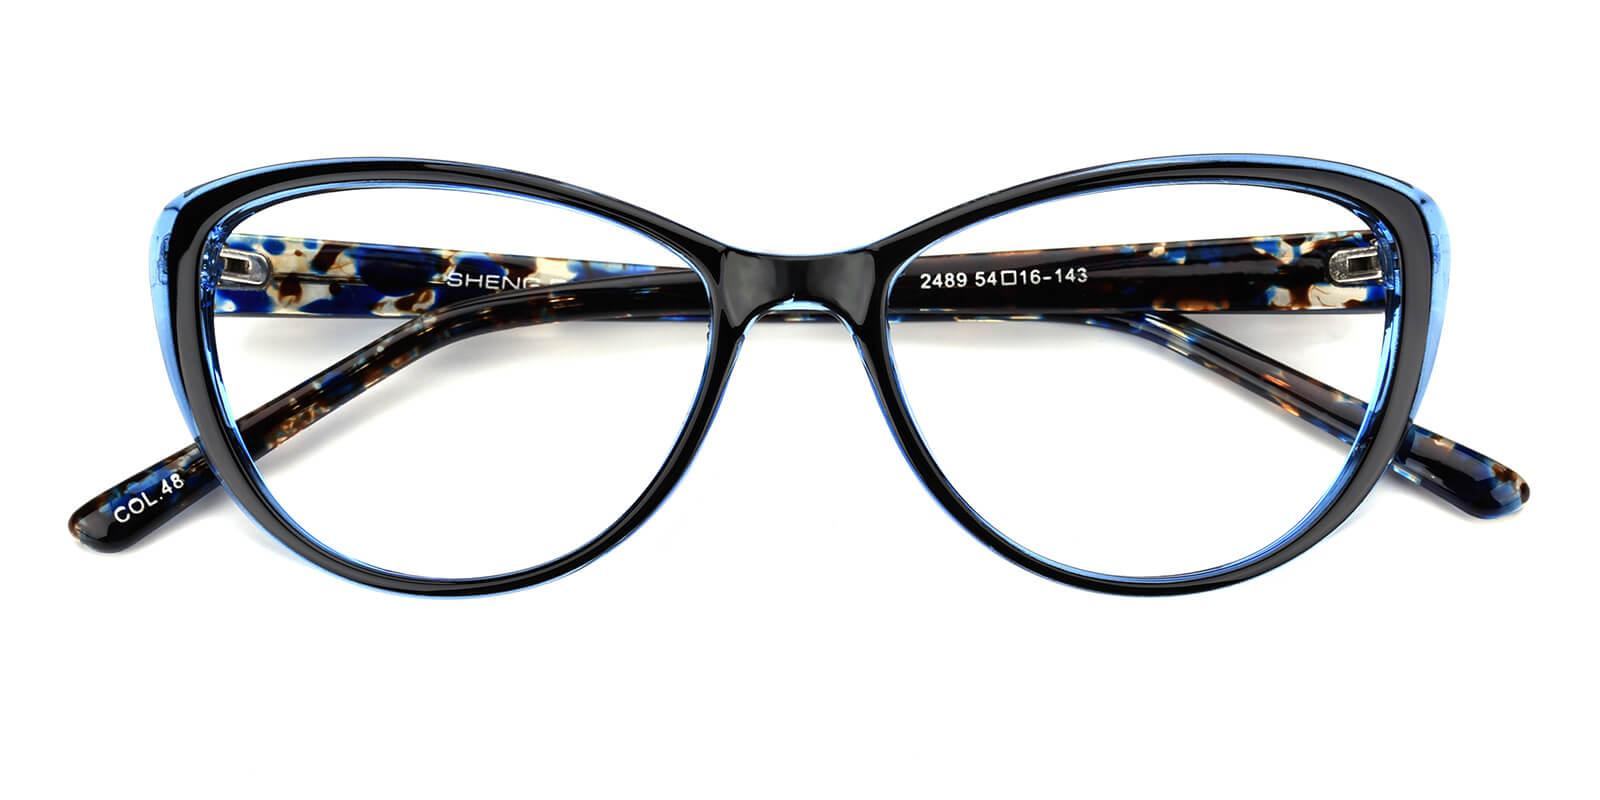 Slackey-Blue-Oval / Cat-Acetate-Eyeglasses-detail